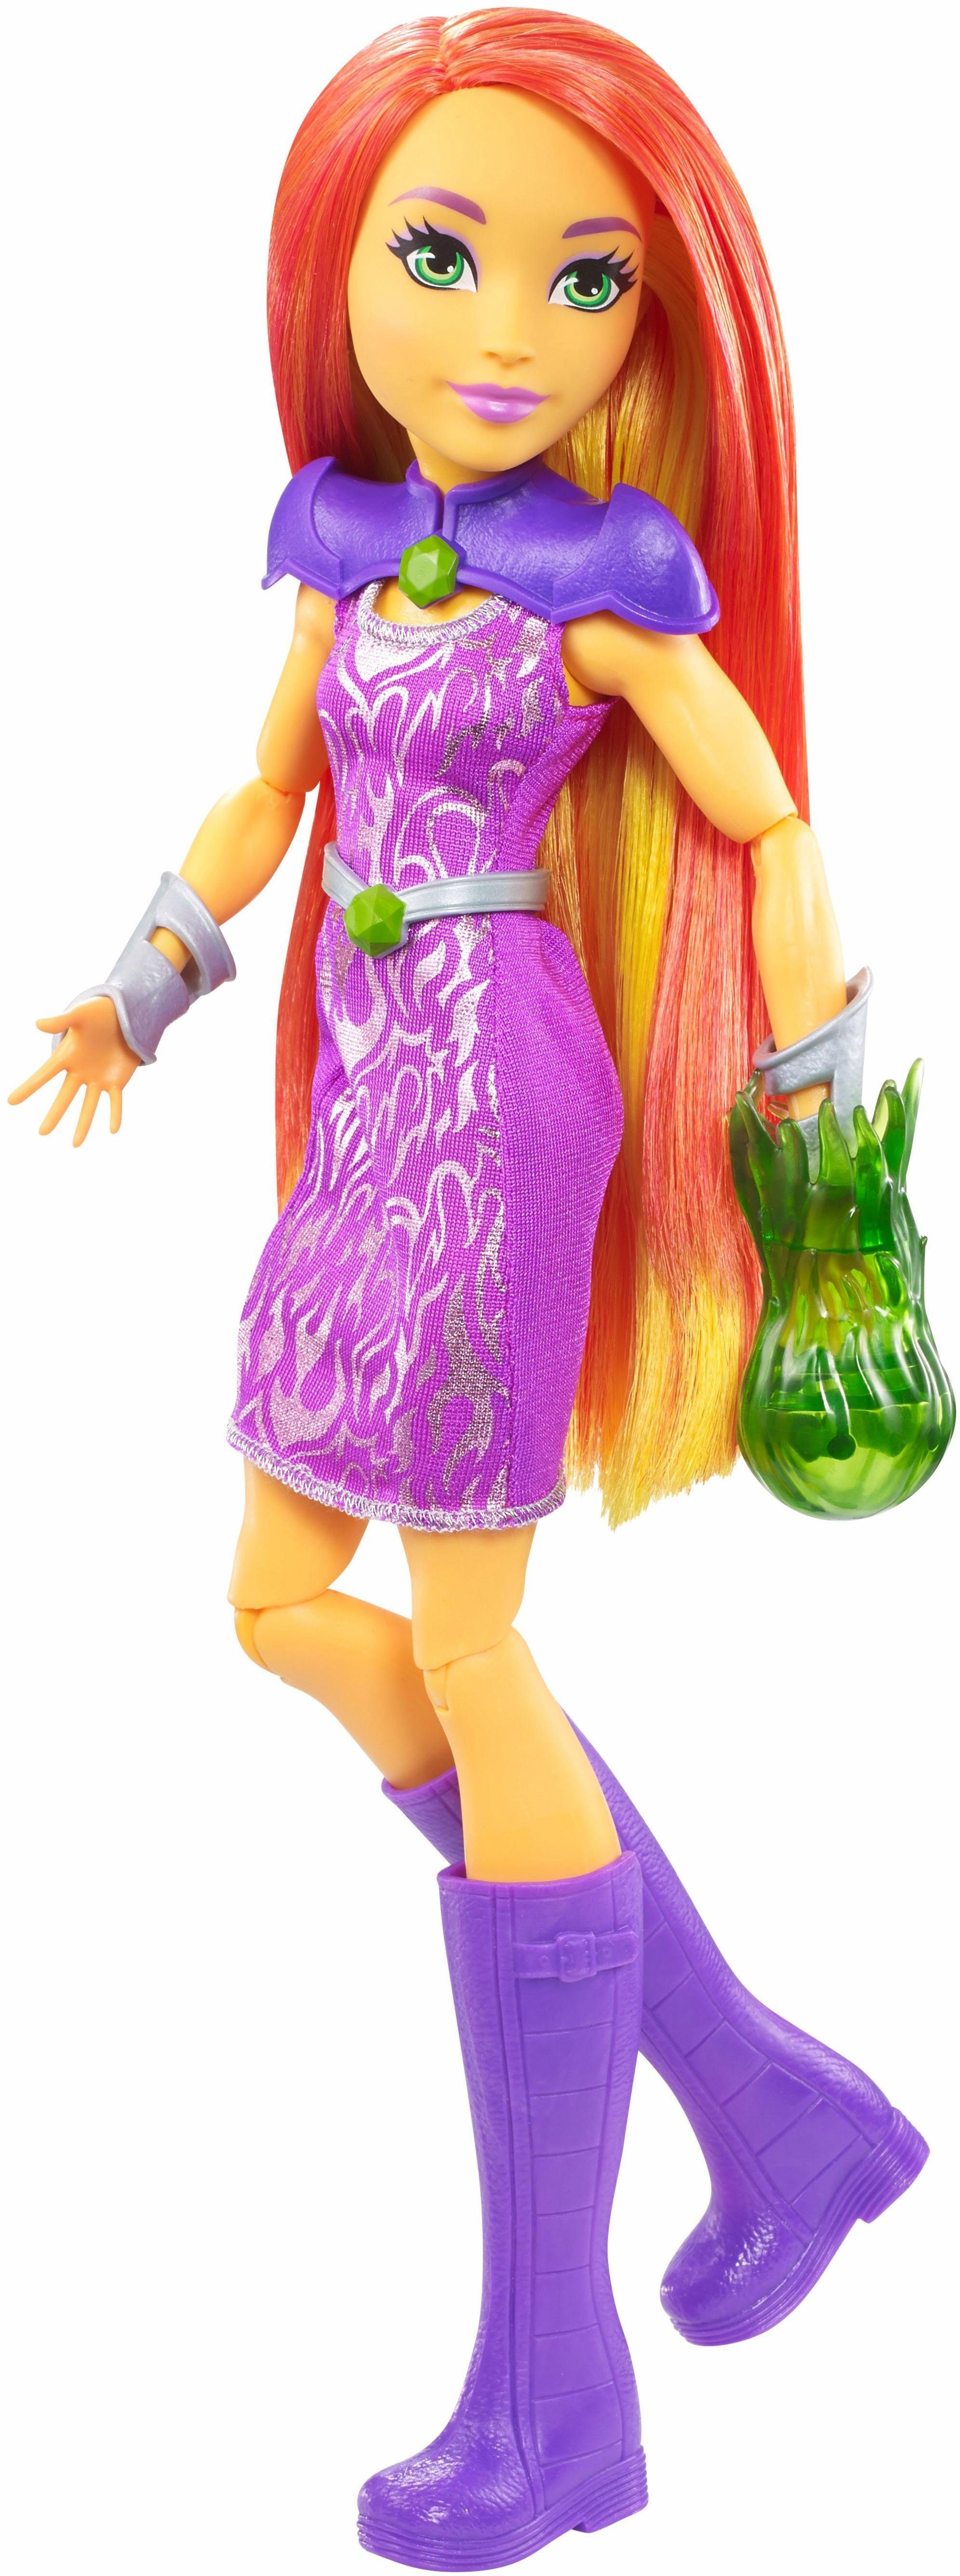 Mattel Actionfigur, »DC Super Hero Girls Starfire«